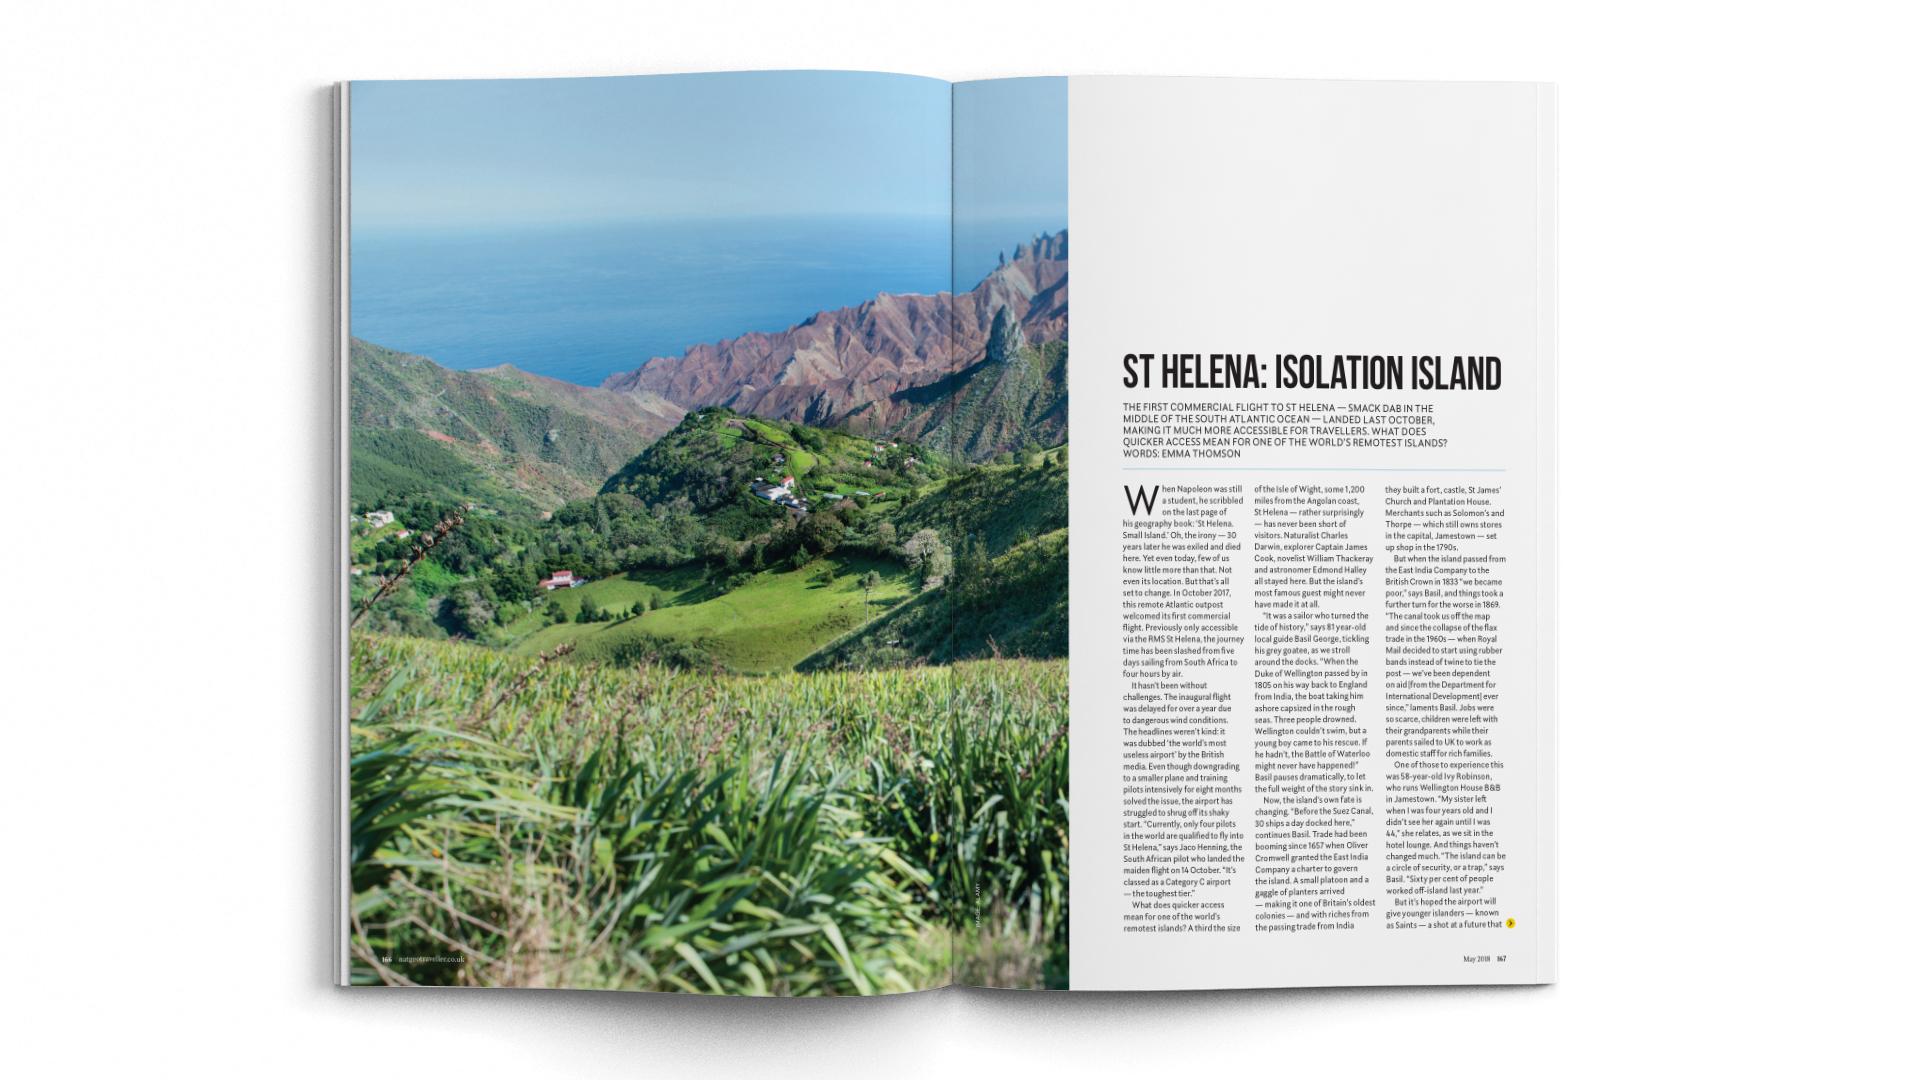 A4-Magazine-DPS-NGT-TT-Report-St-Helena-1